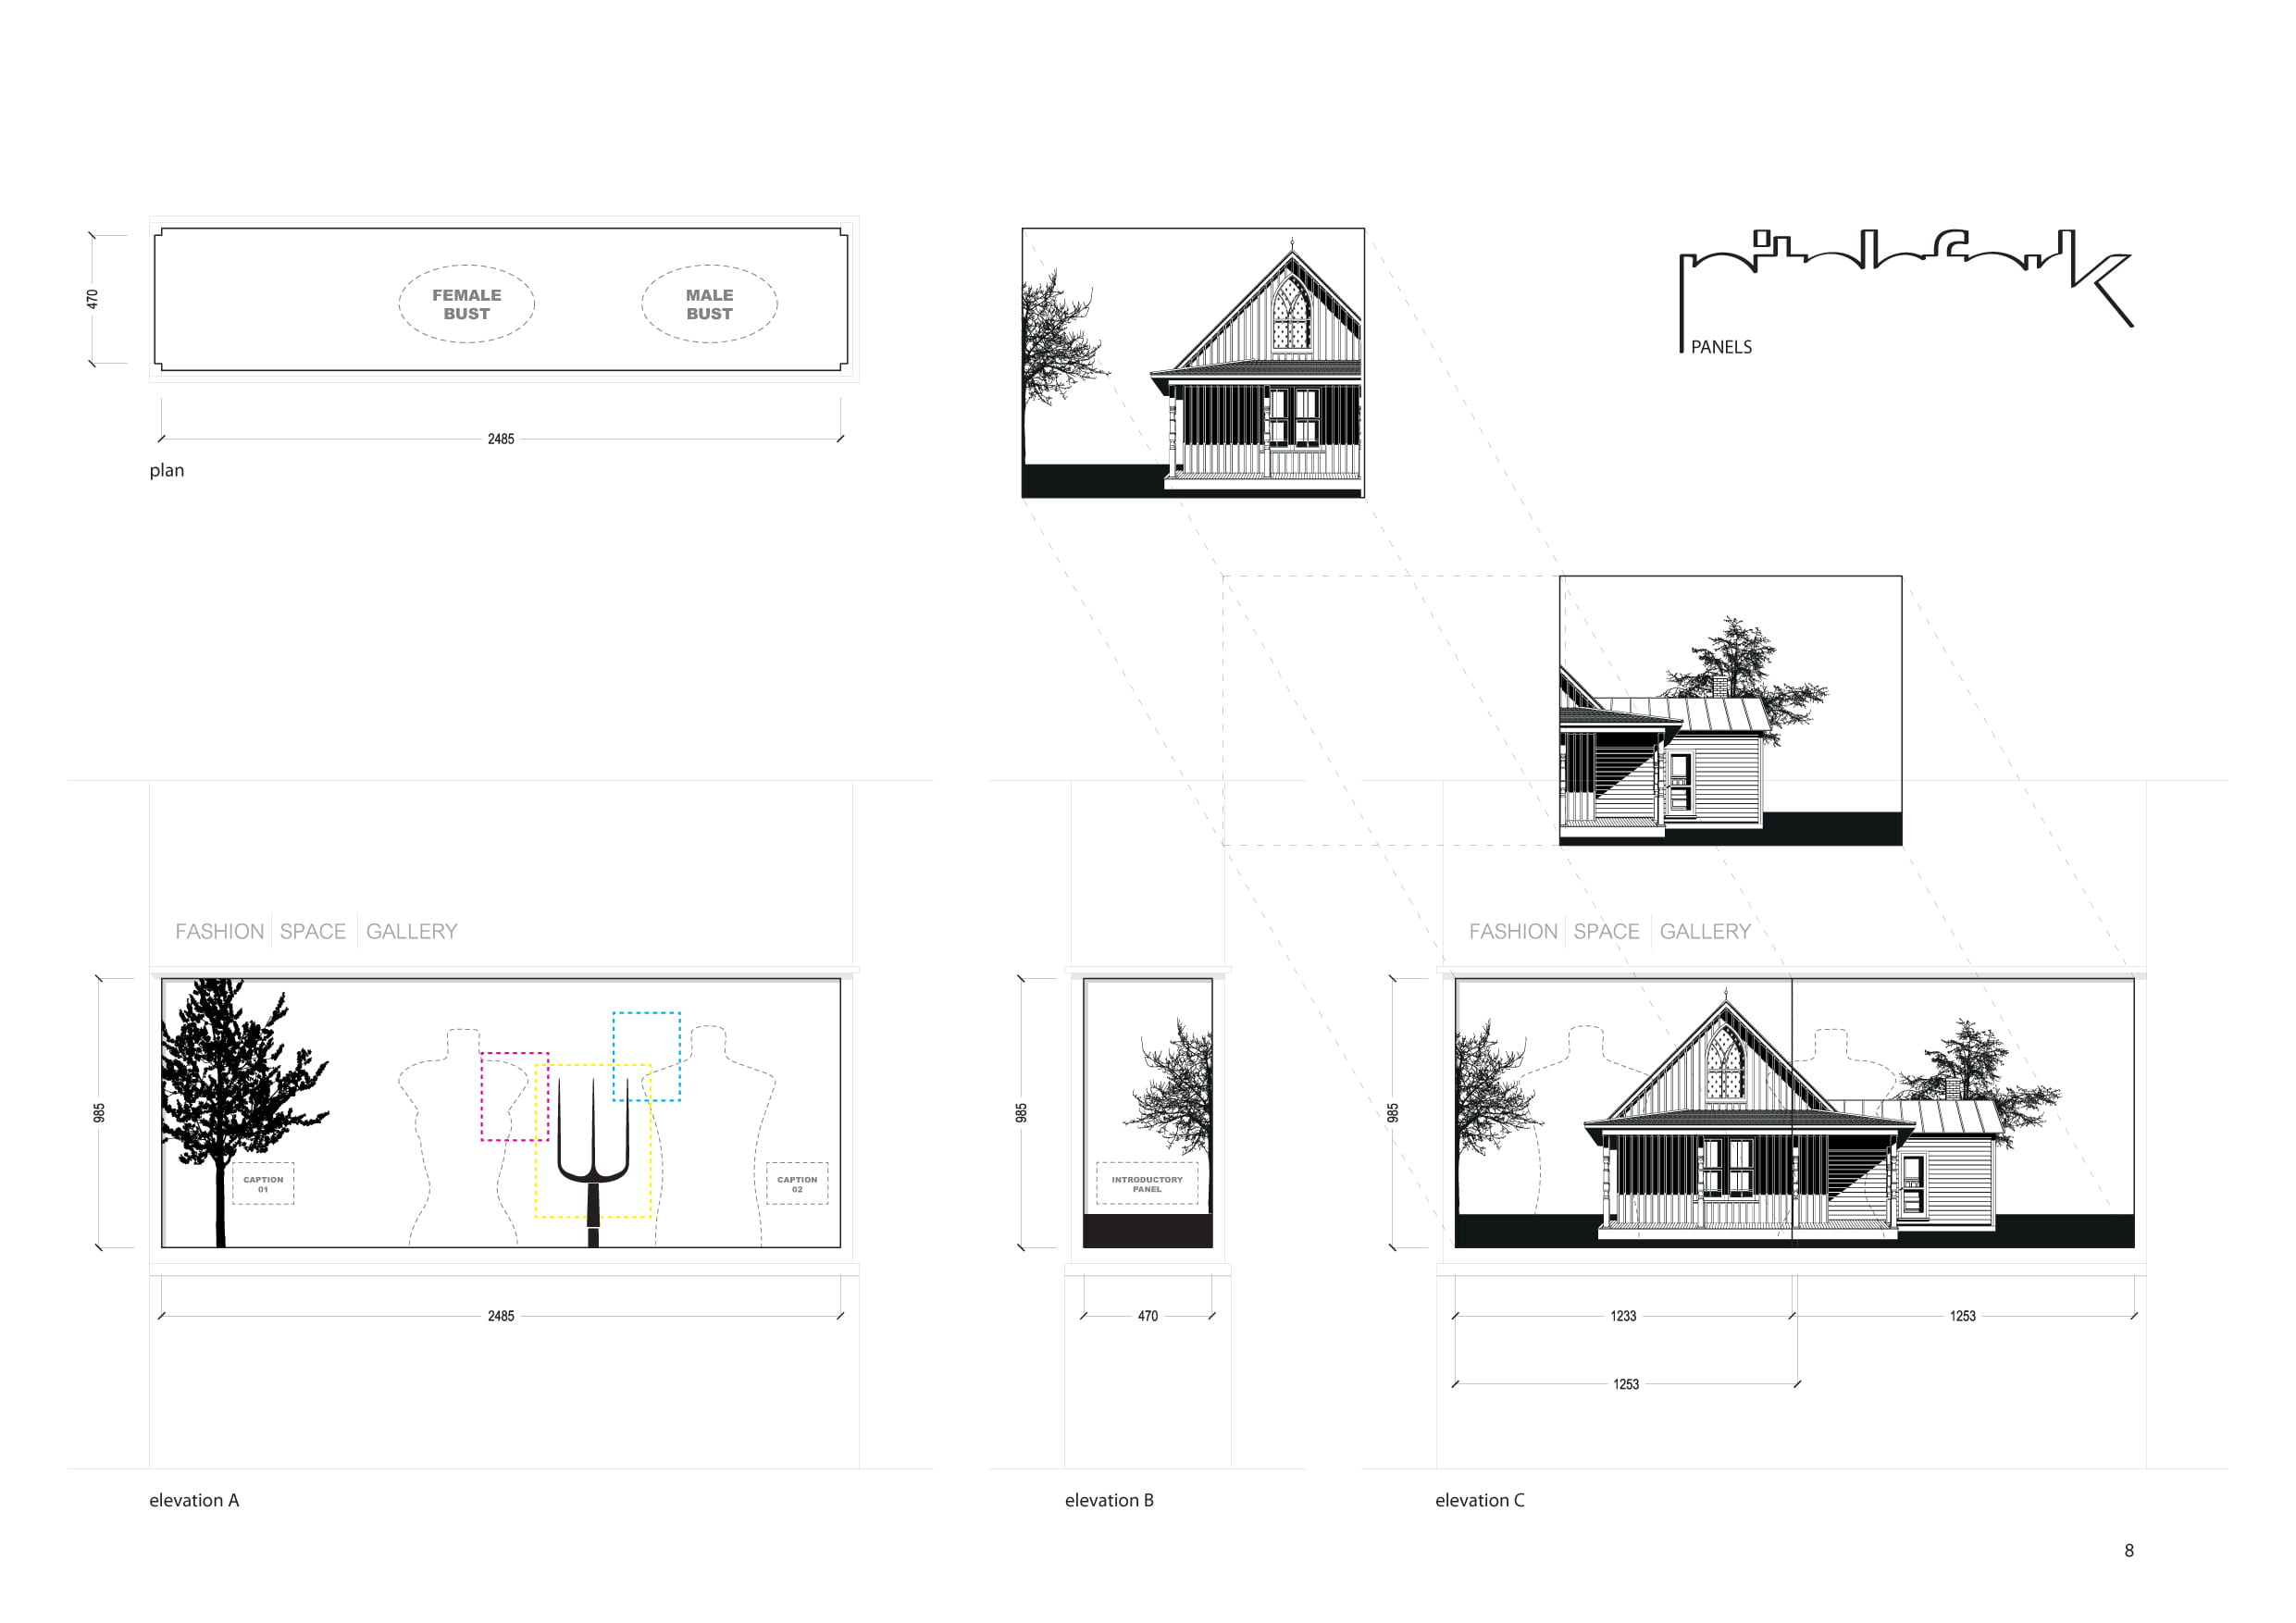 P drawings